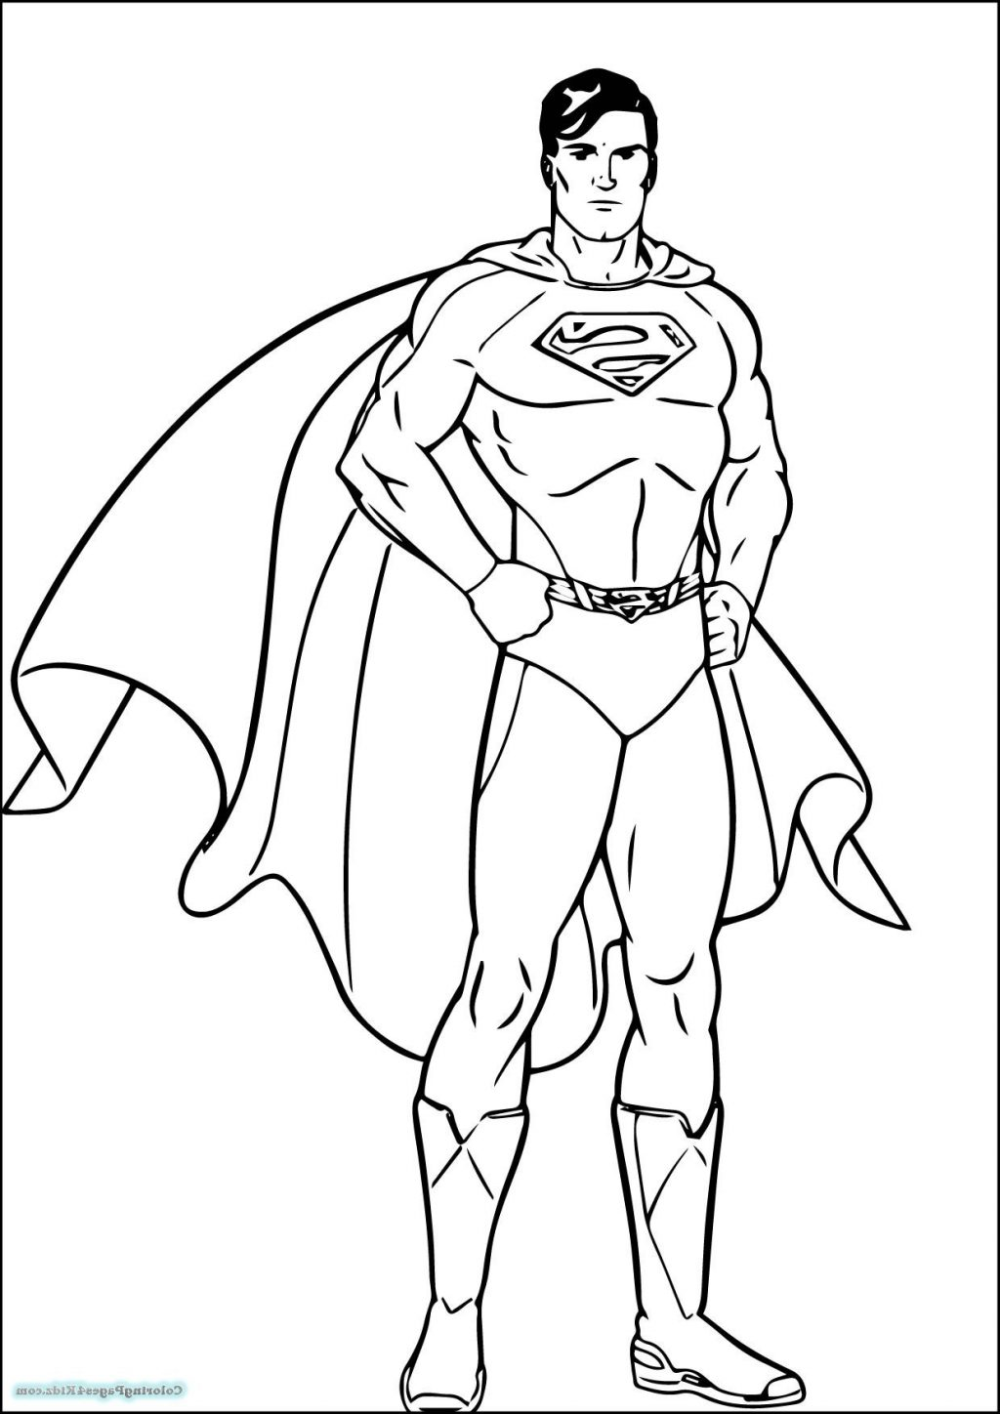 - Coloring Book : Batman Vs Superman Colouring Book Cactus Coloring